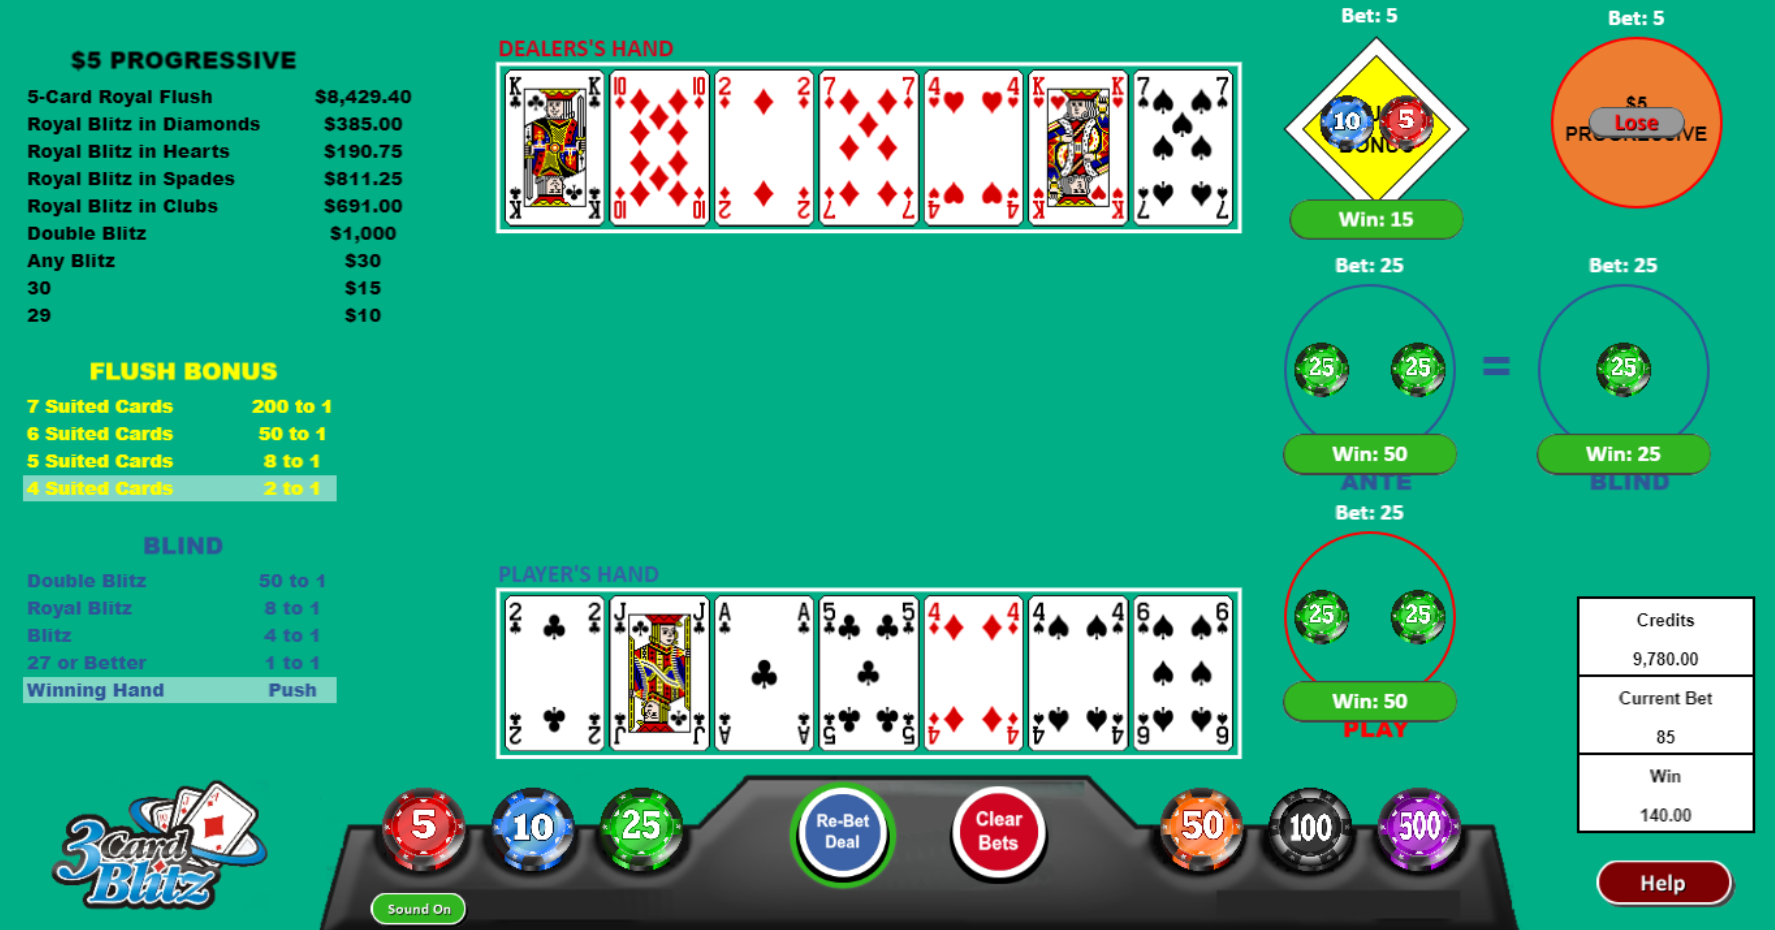 progressive betting 3 card poker